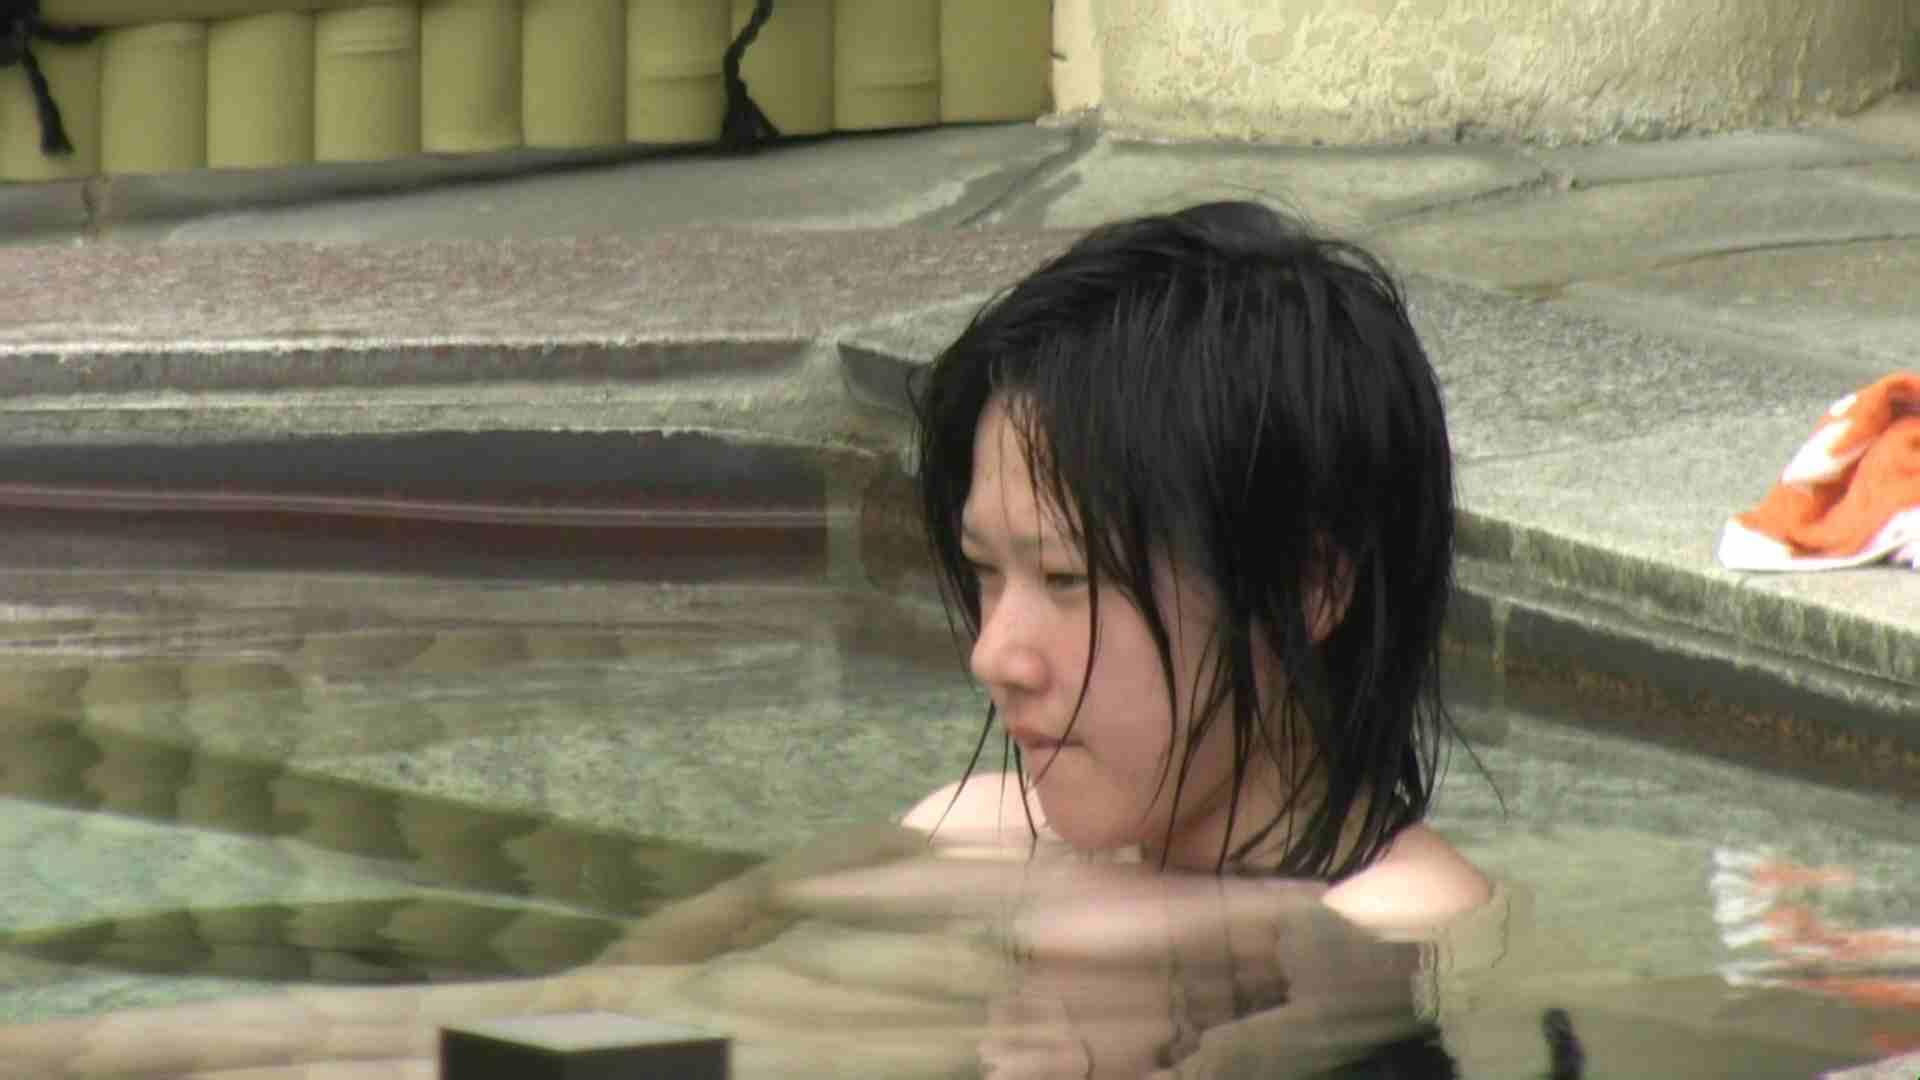 Aquaな露天風呂Vol.36 OL女体  78連発 42